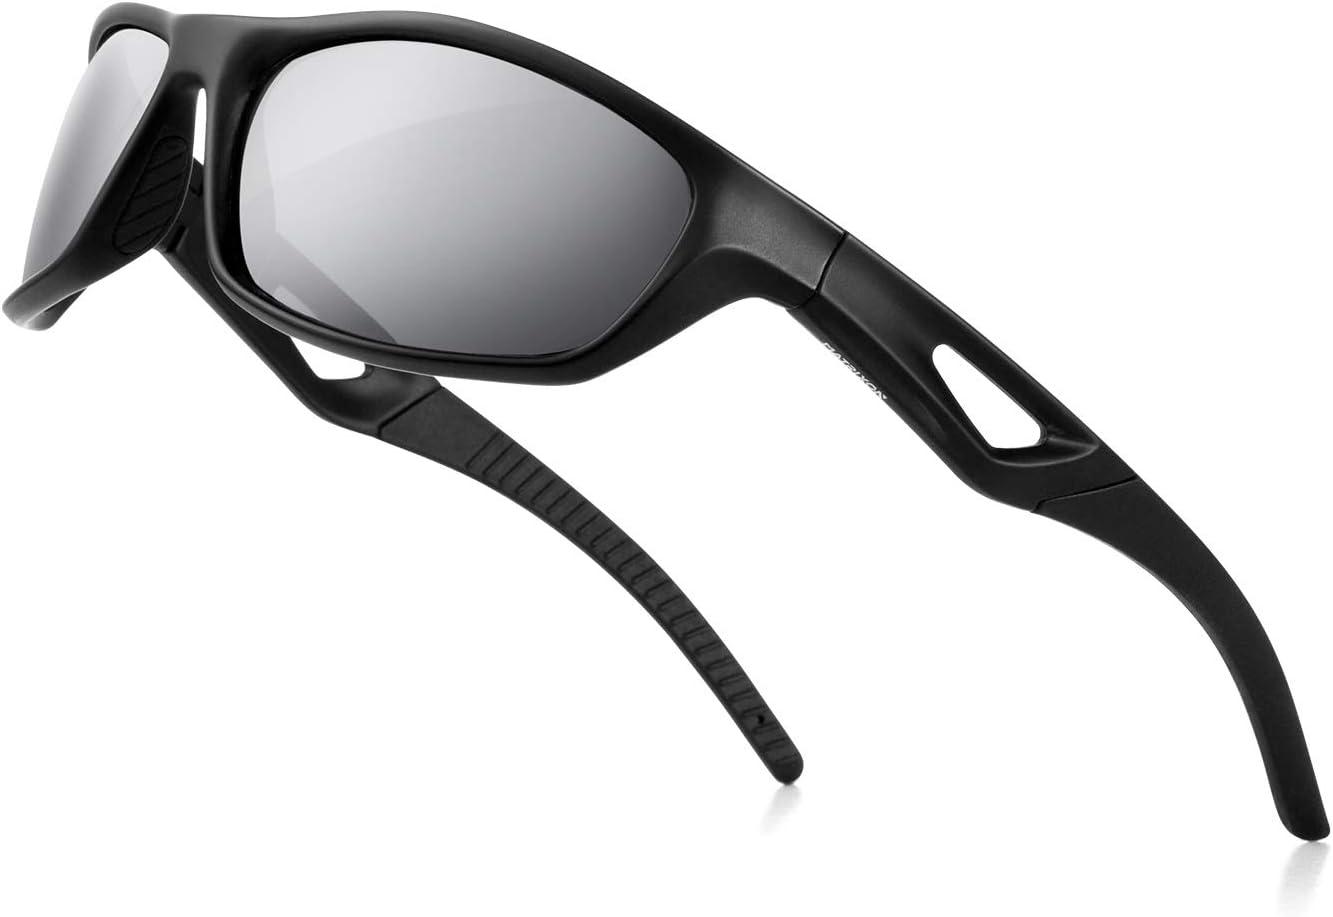 MATRIXON Polarized Sports Sunglasses Cycling Sun Glasses for Men Women Running Driving Golf Baseball